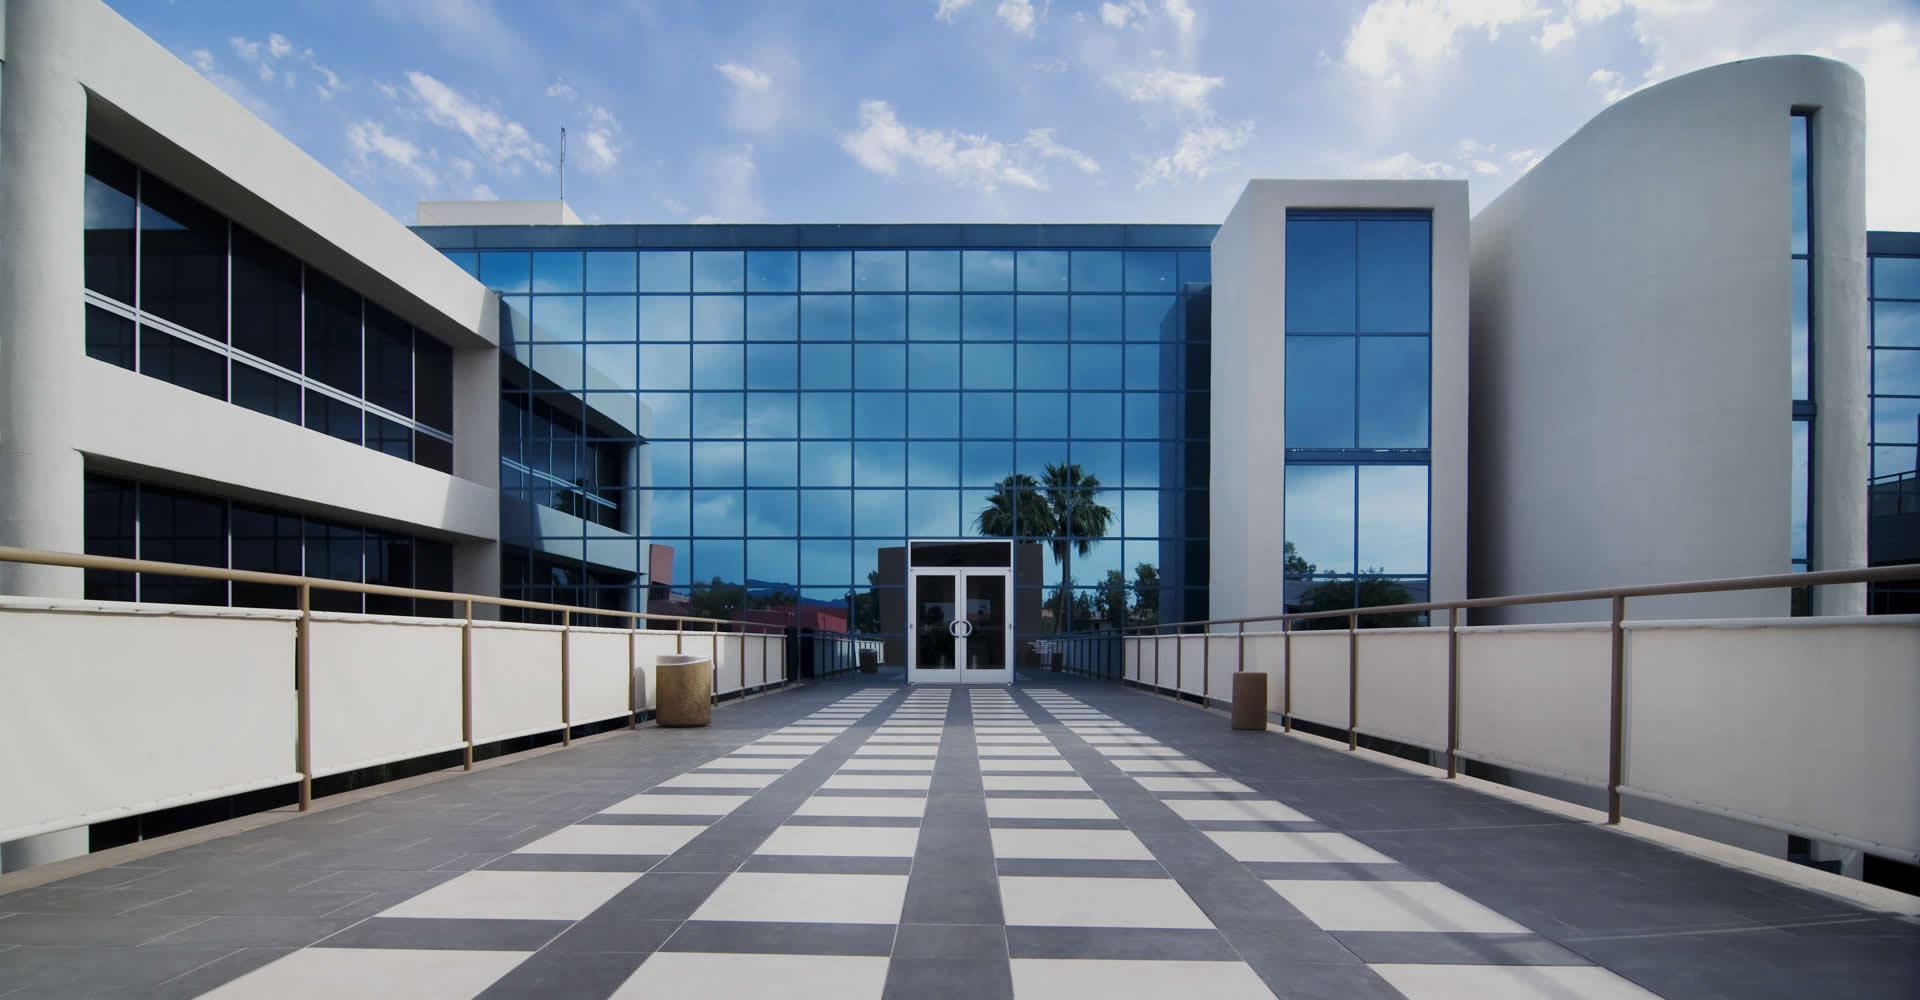 Estudio de arquitectura en getafe arquitectos en getafe - Estudios arquitectura espana ...